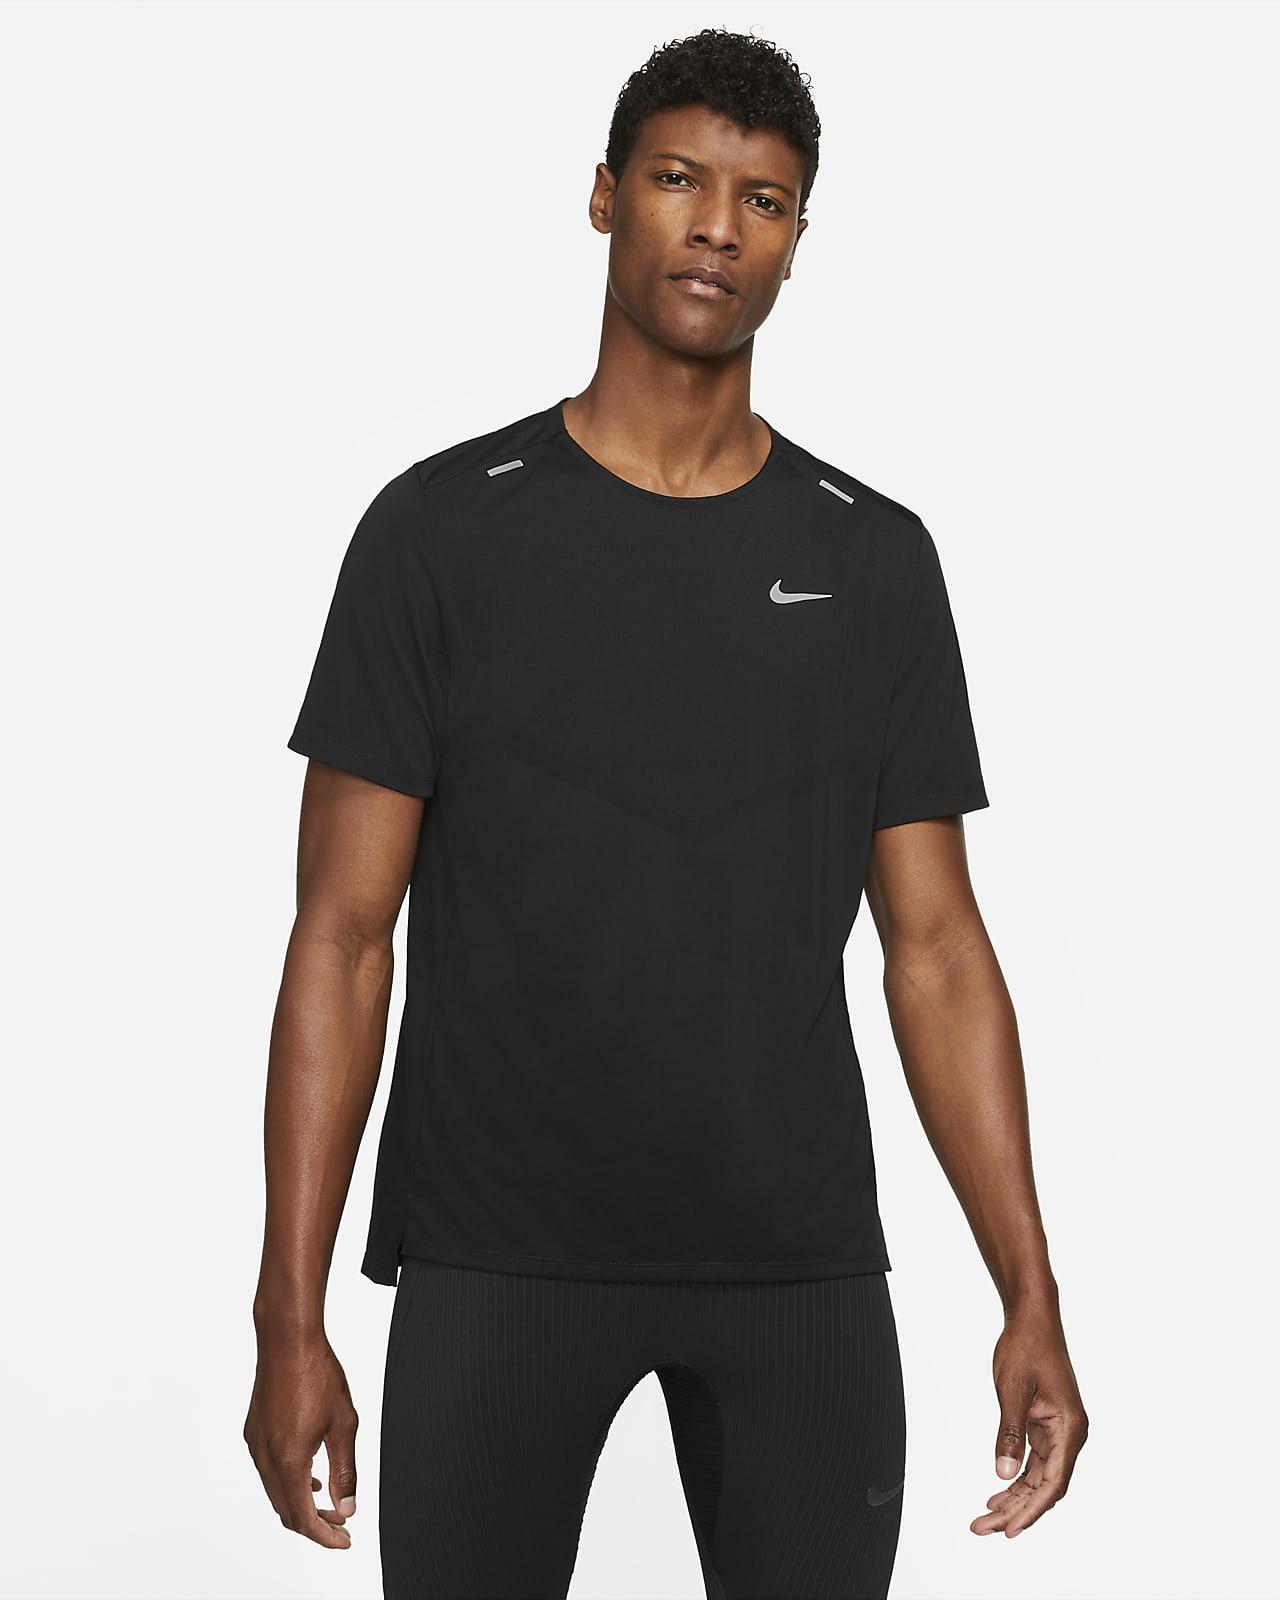 Nike Dri-FIT Rise 365 Hardlooptop met korte mouwen voor heren